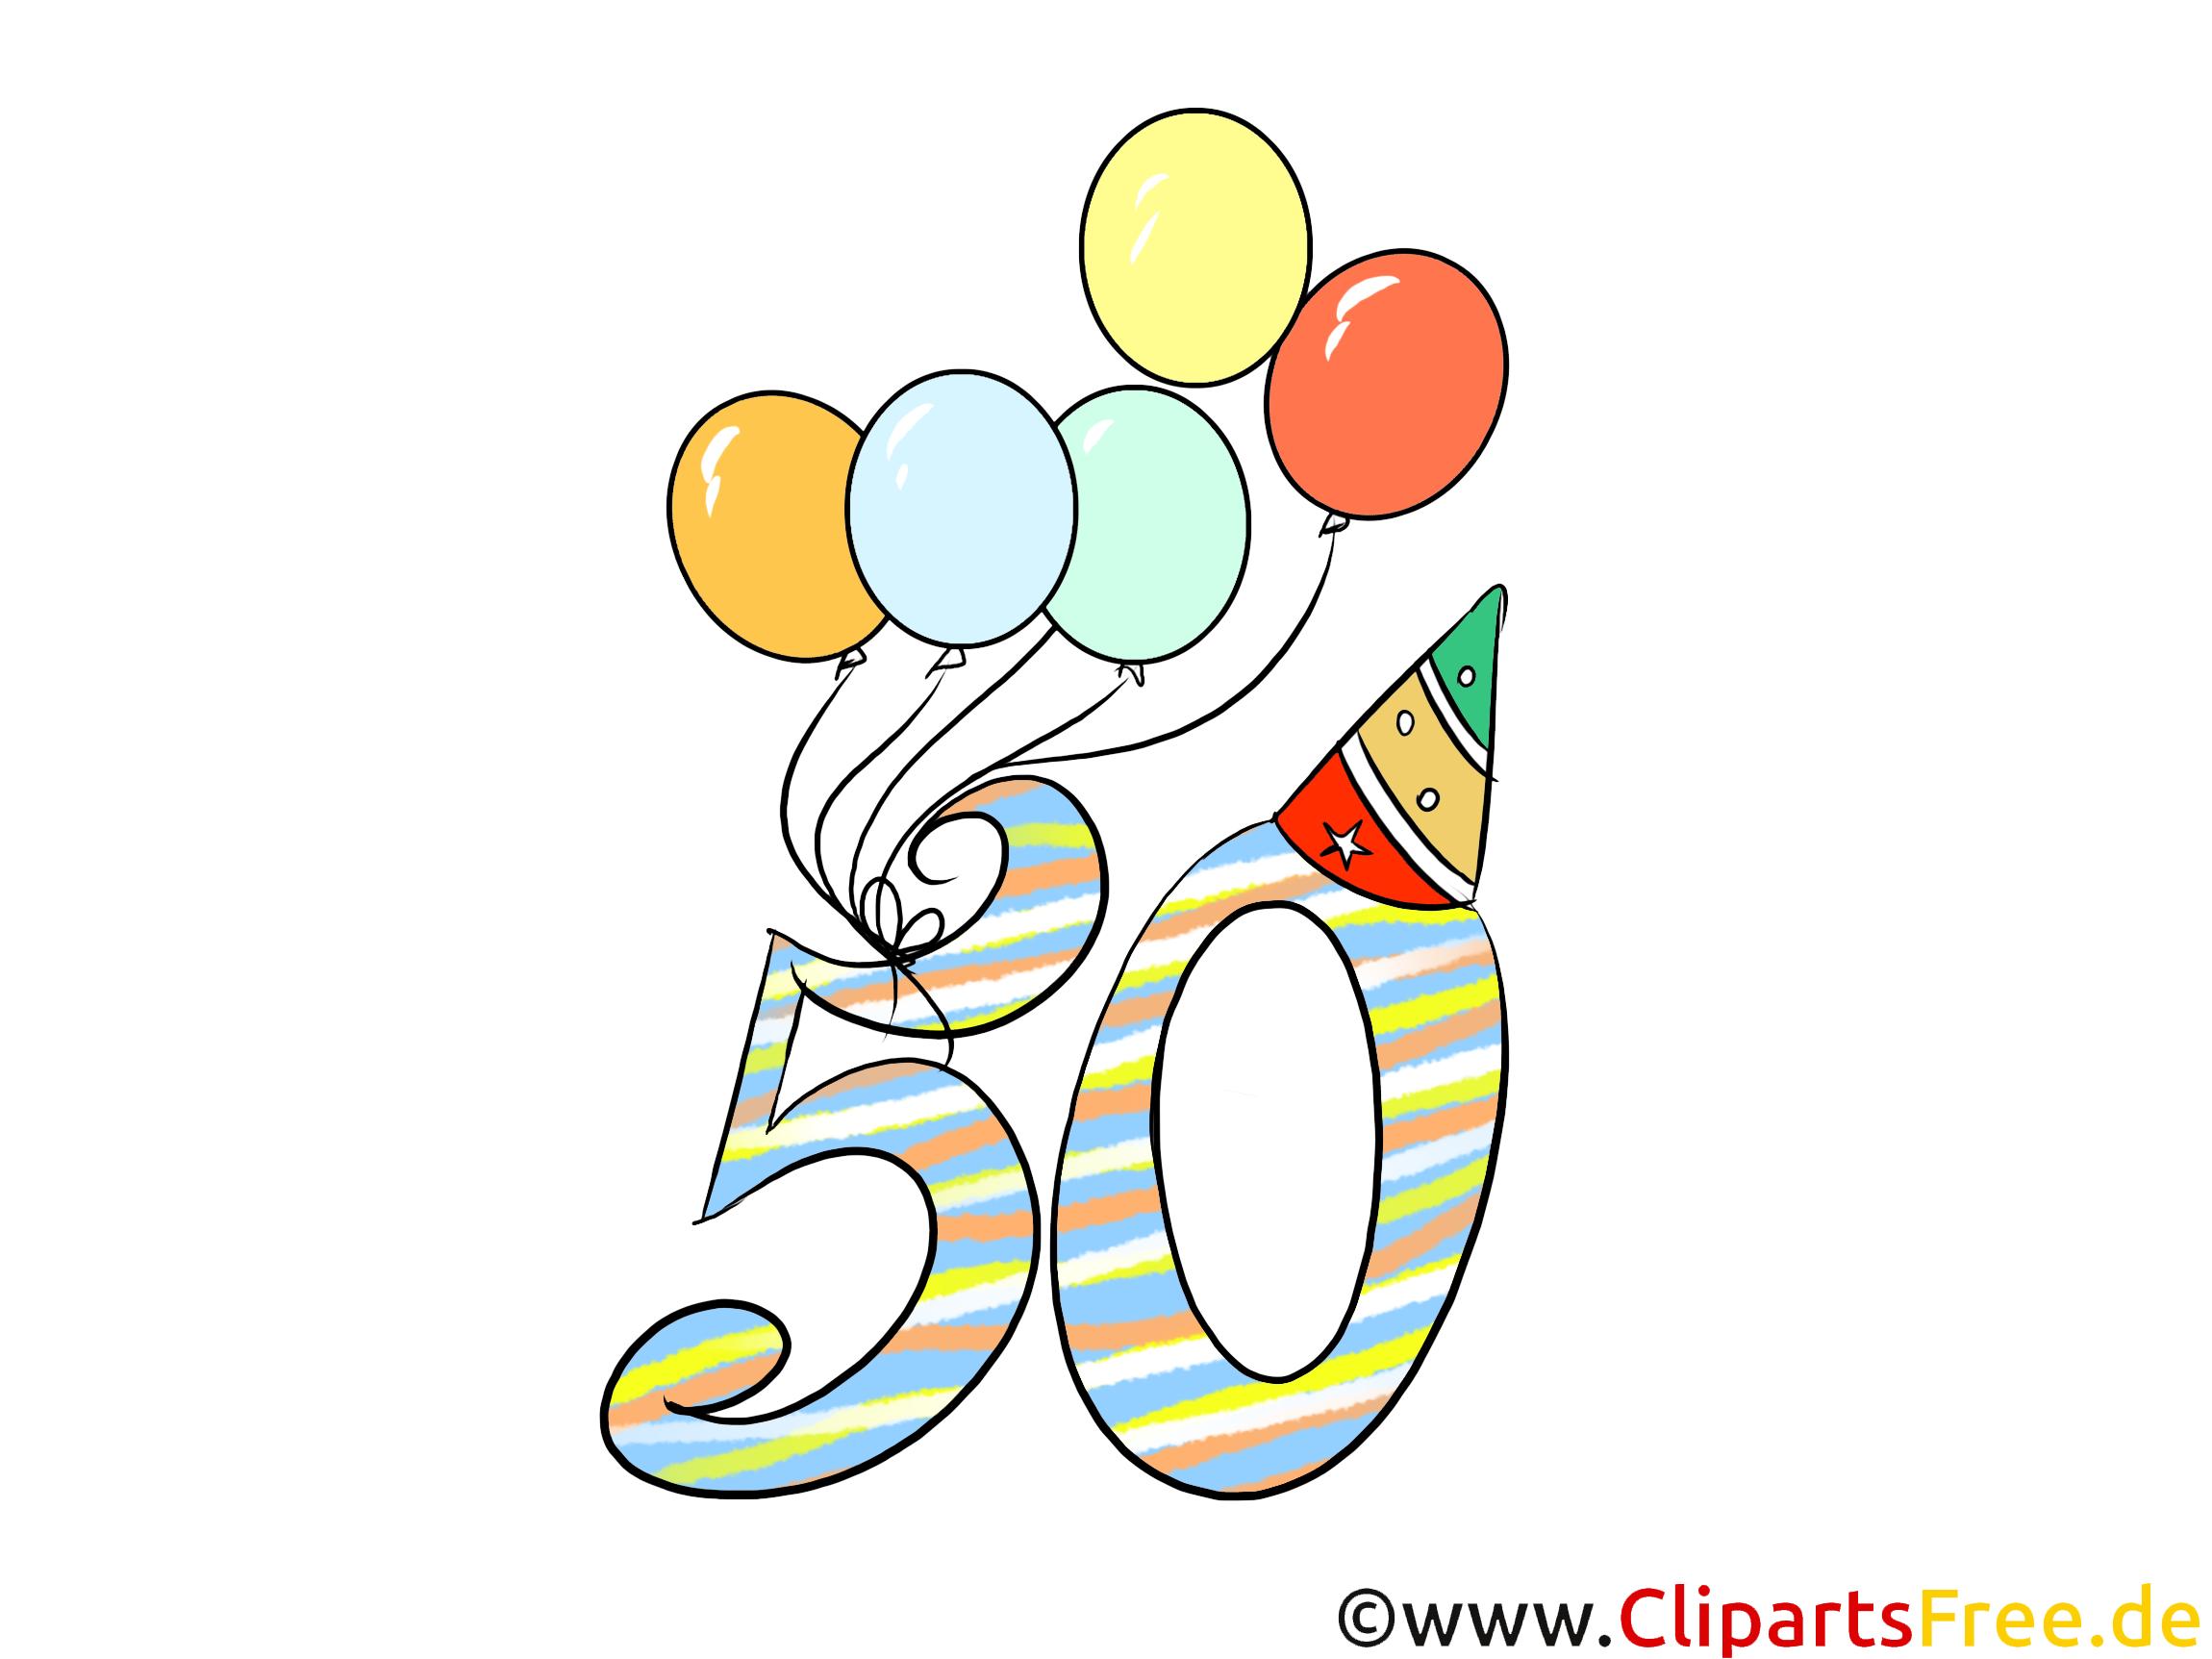 Clipart Geburtstag 50